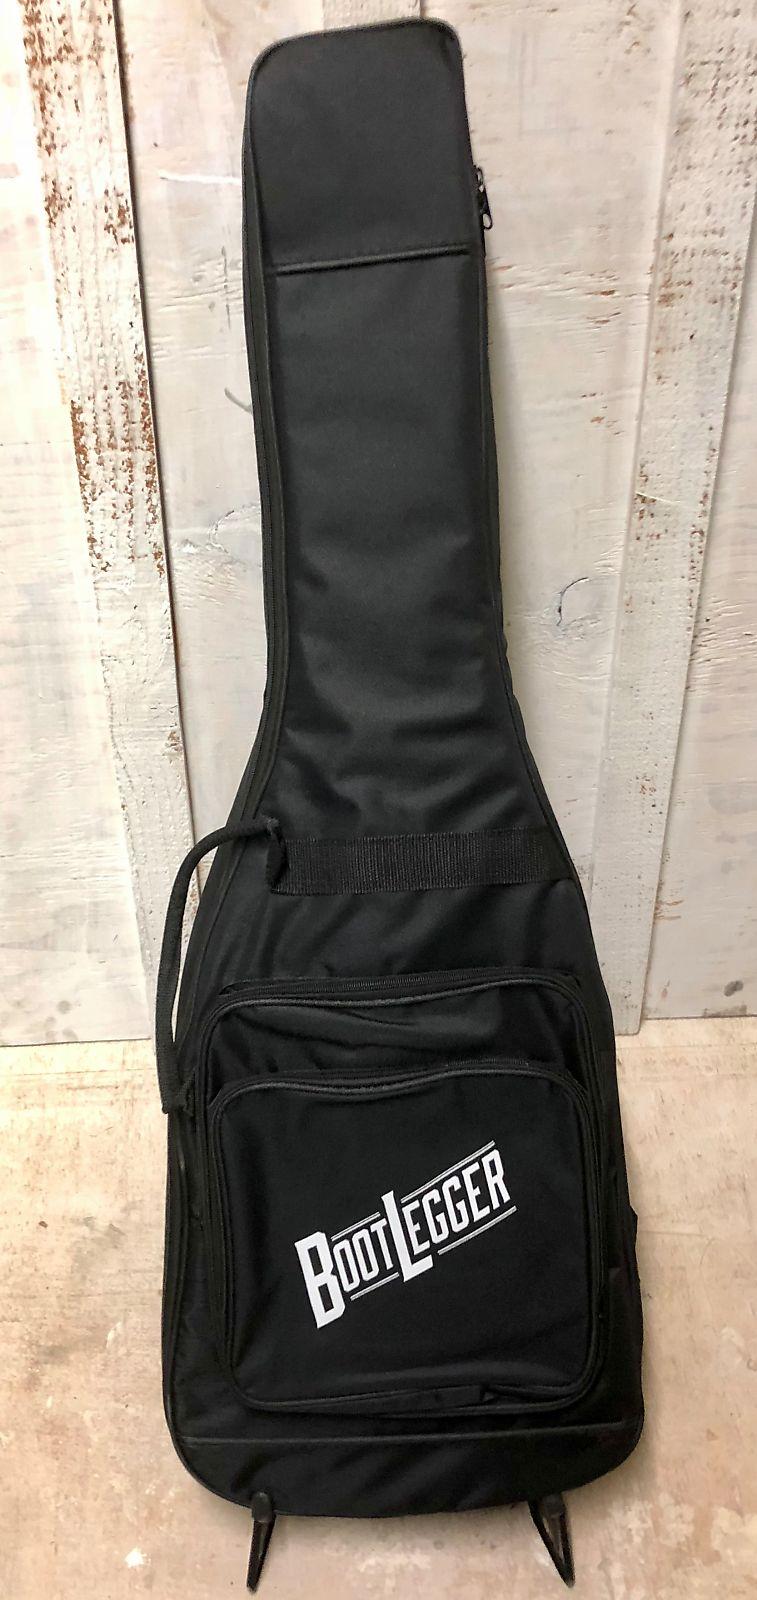 Bootlegger Single Barrel  Violin Gloss. Maple Body P90 & Single Coil With Case